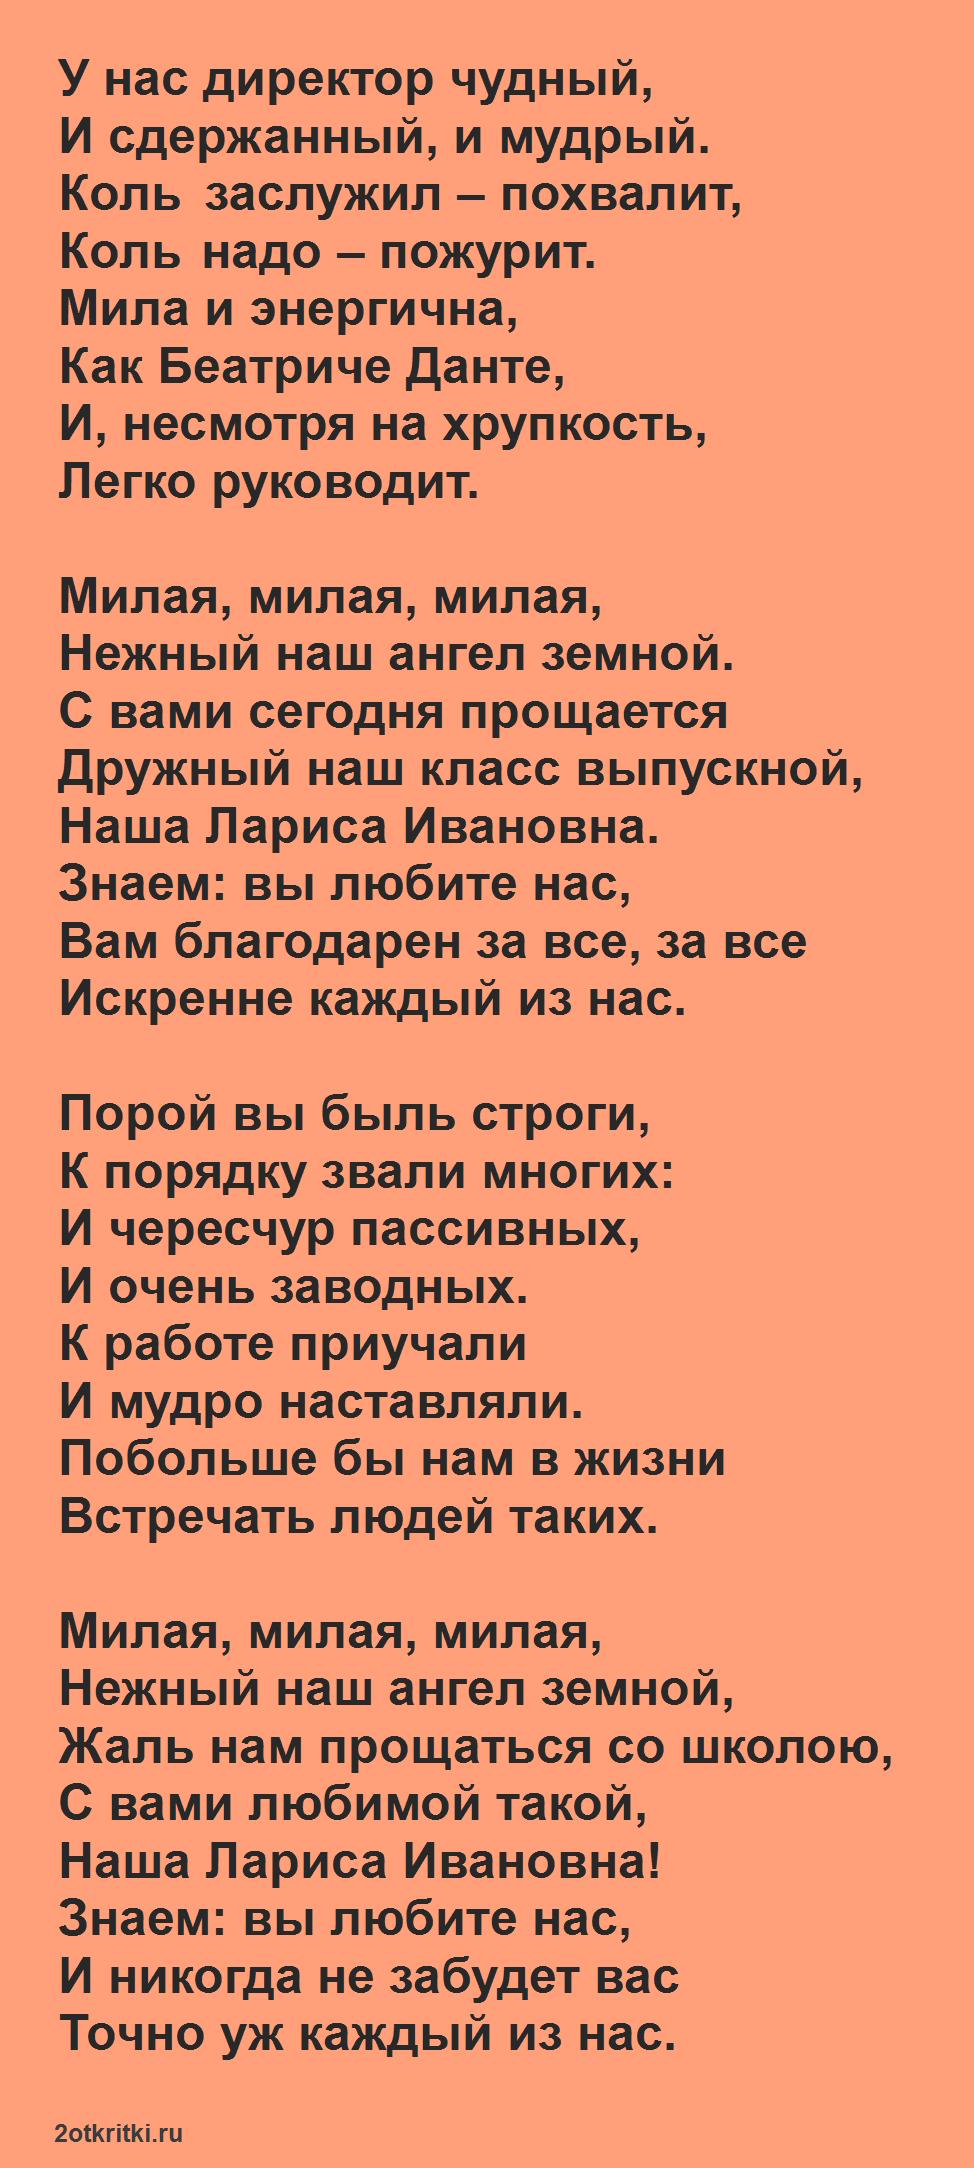 Песни на последний звонок 11 класс - песня директору, на мотив песни Киркорова 'Милая'